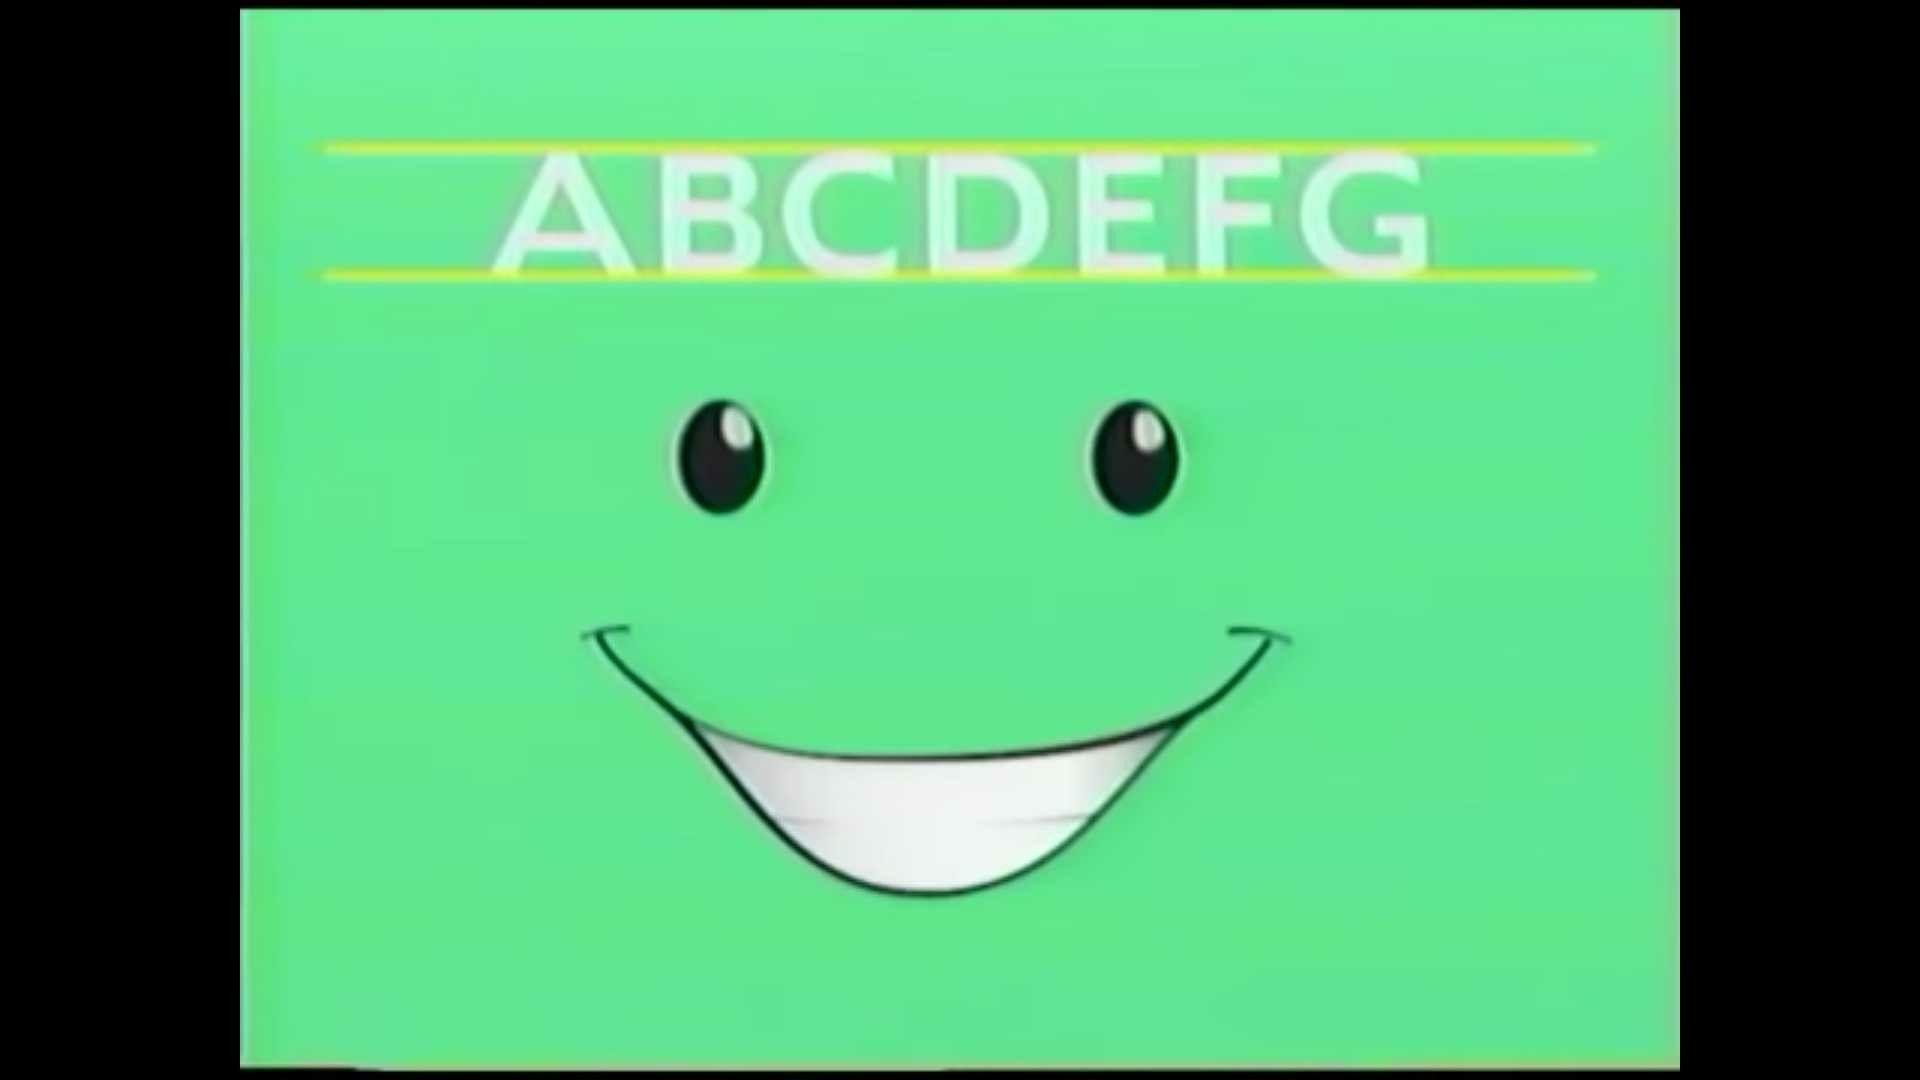 Nick Jr Face Alphabet Song Blues Clues Version Nick Jr Face And